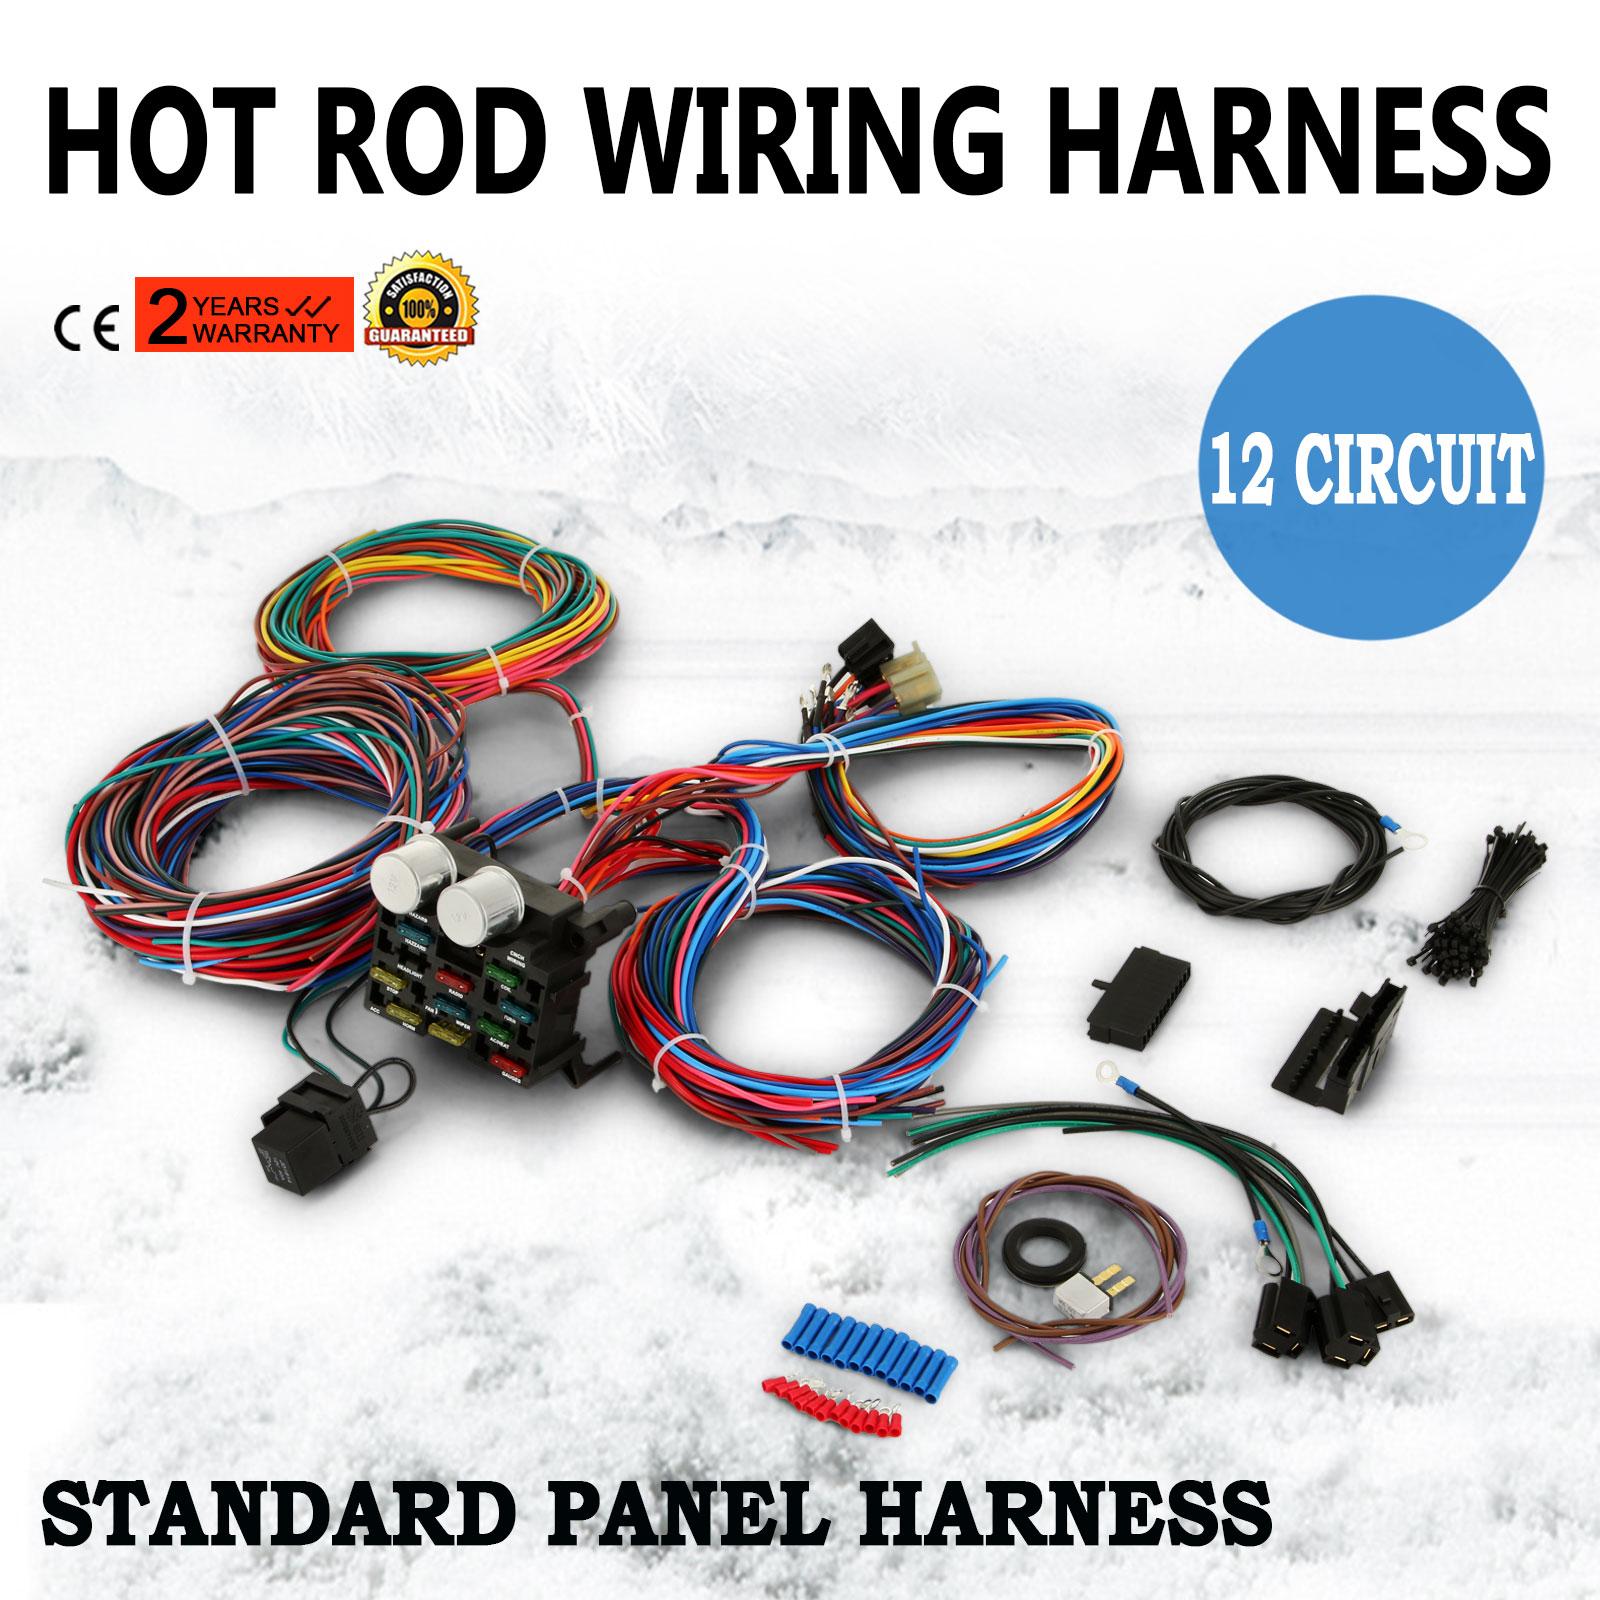 Pop 12 Circuit Harness Fuse Box Street Hot Rat Rod Wiring Car Truck New  800000141426 | eBay